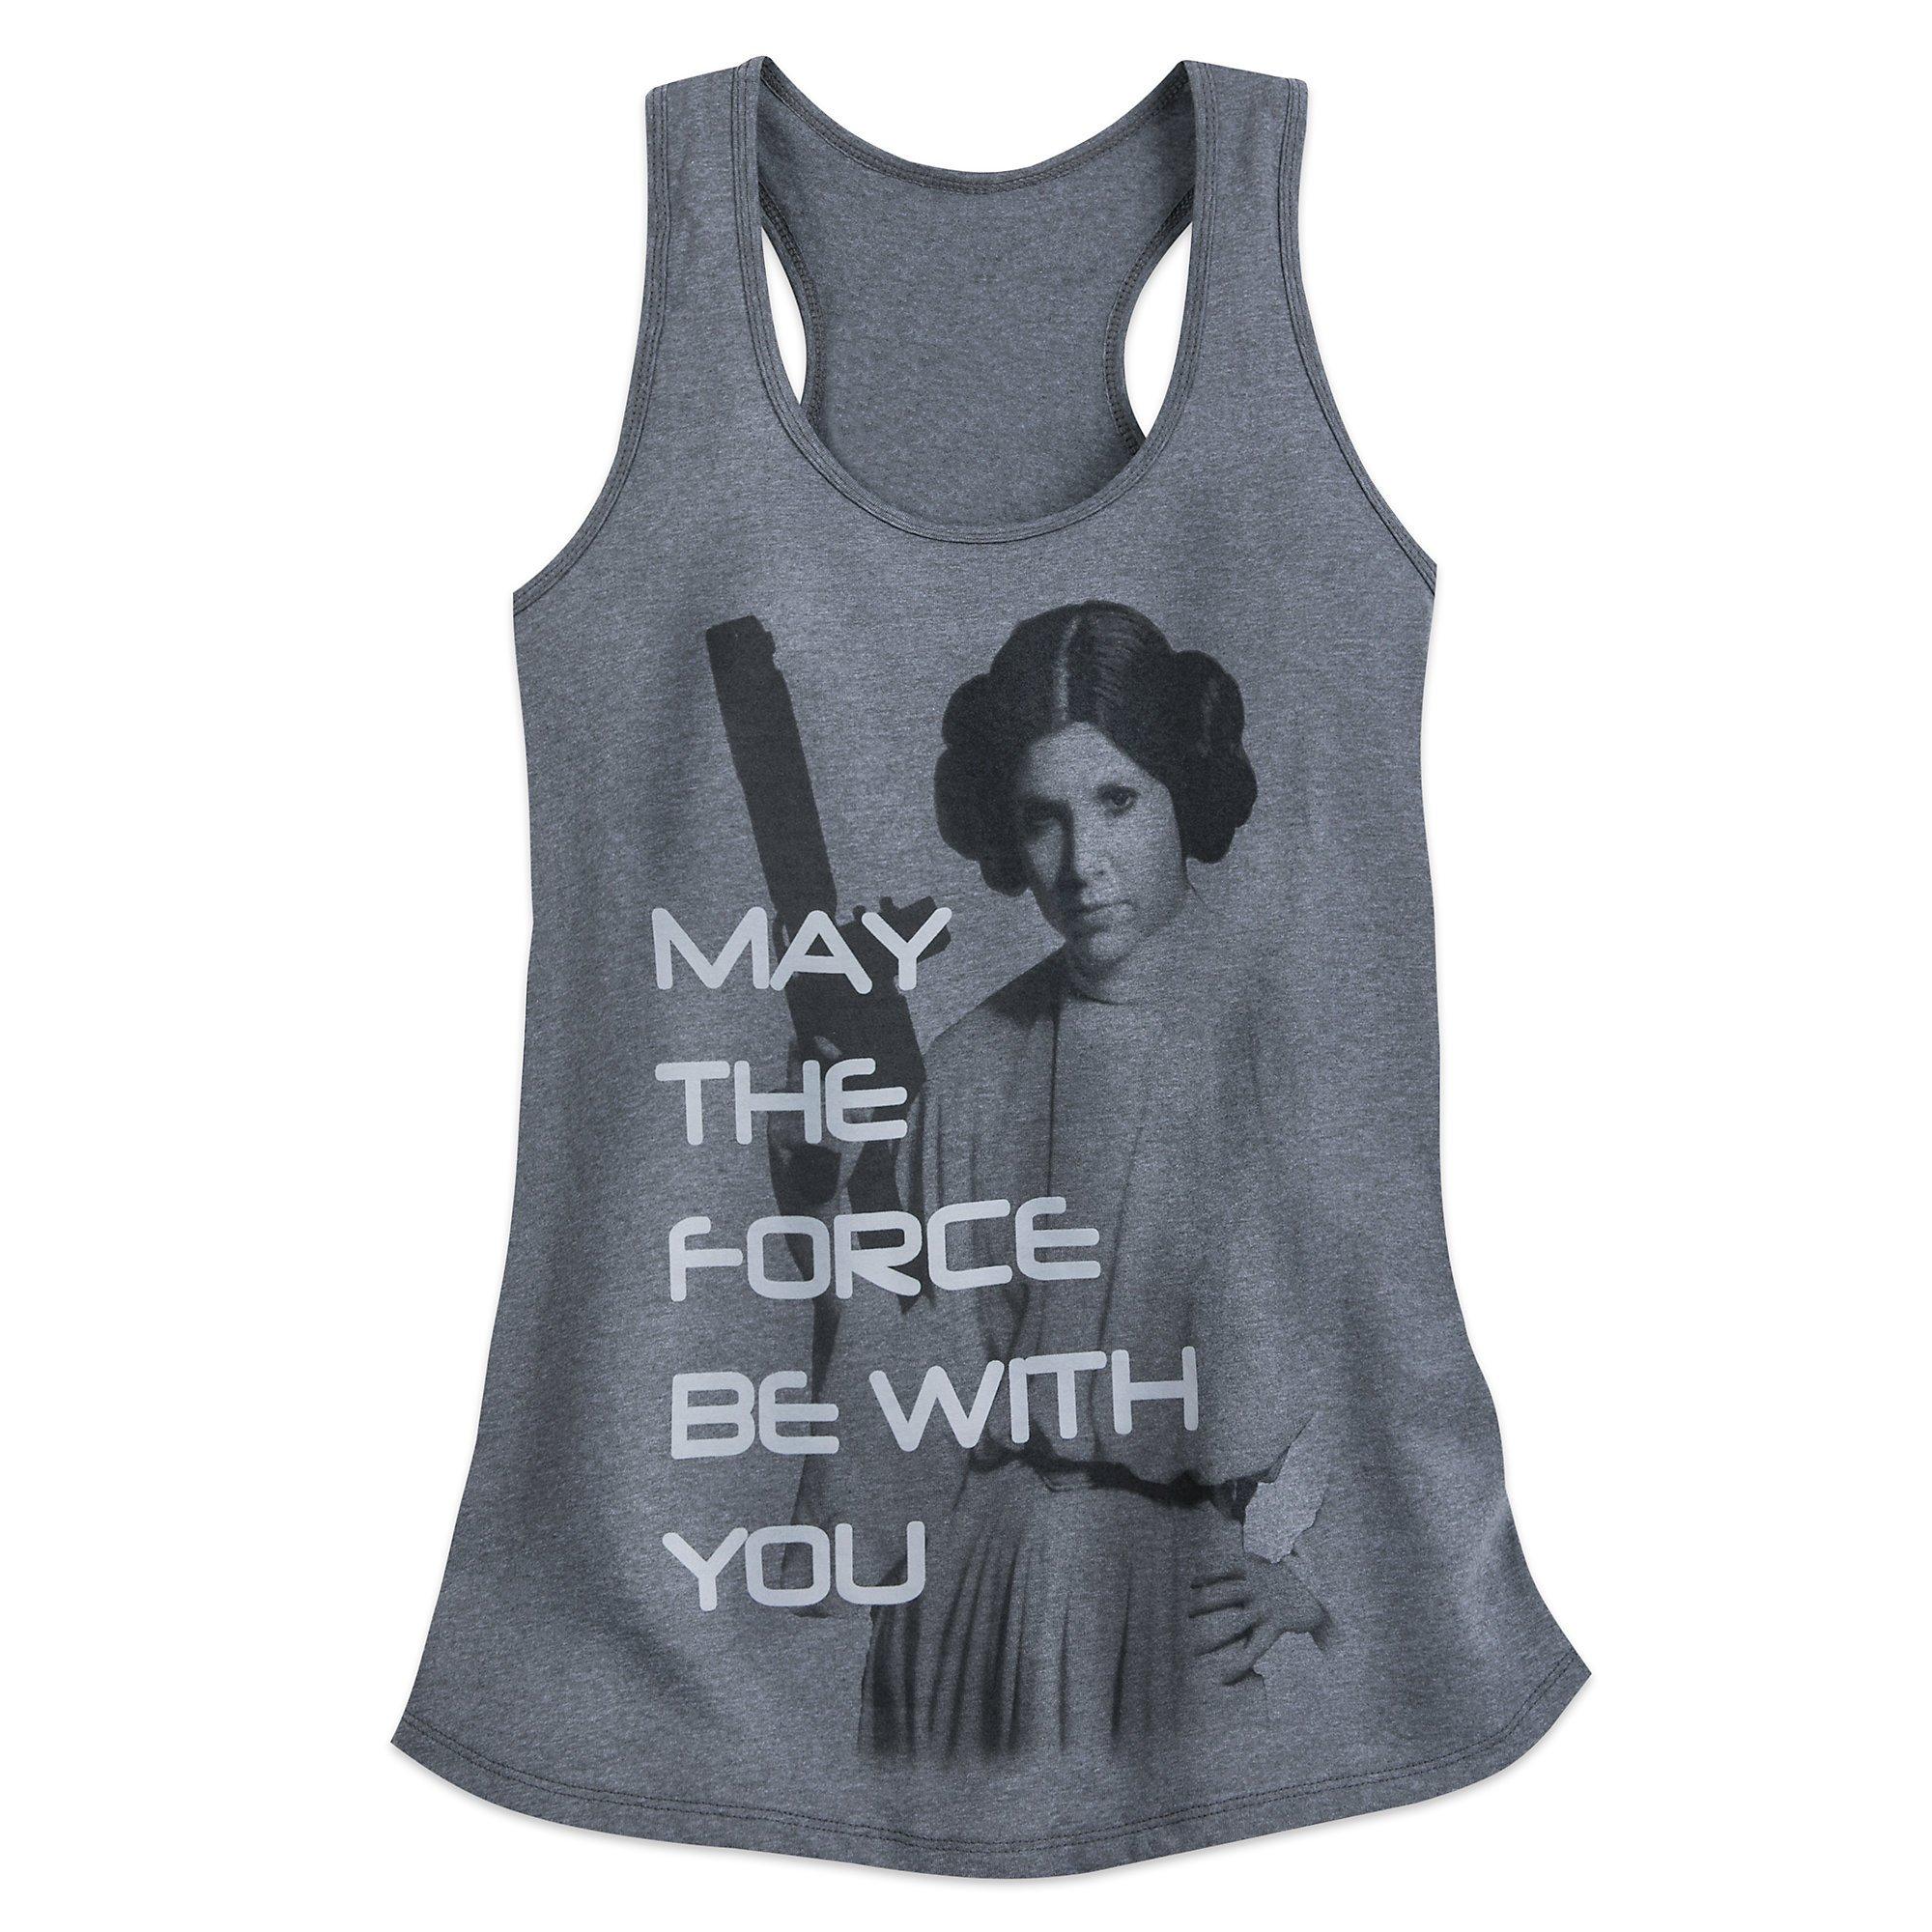 Star Wars SW-TNK-MAY4TH-LEIA-L-S18 Size Ladies XL Gray 456207389125